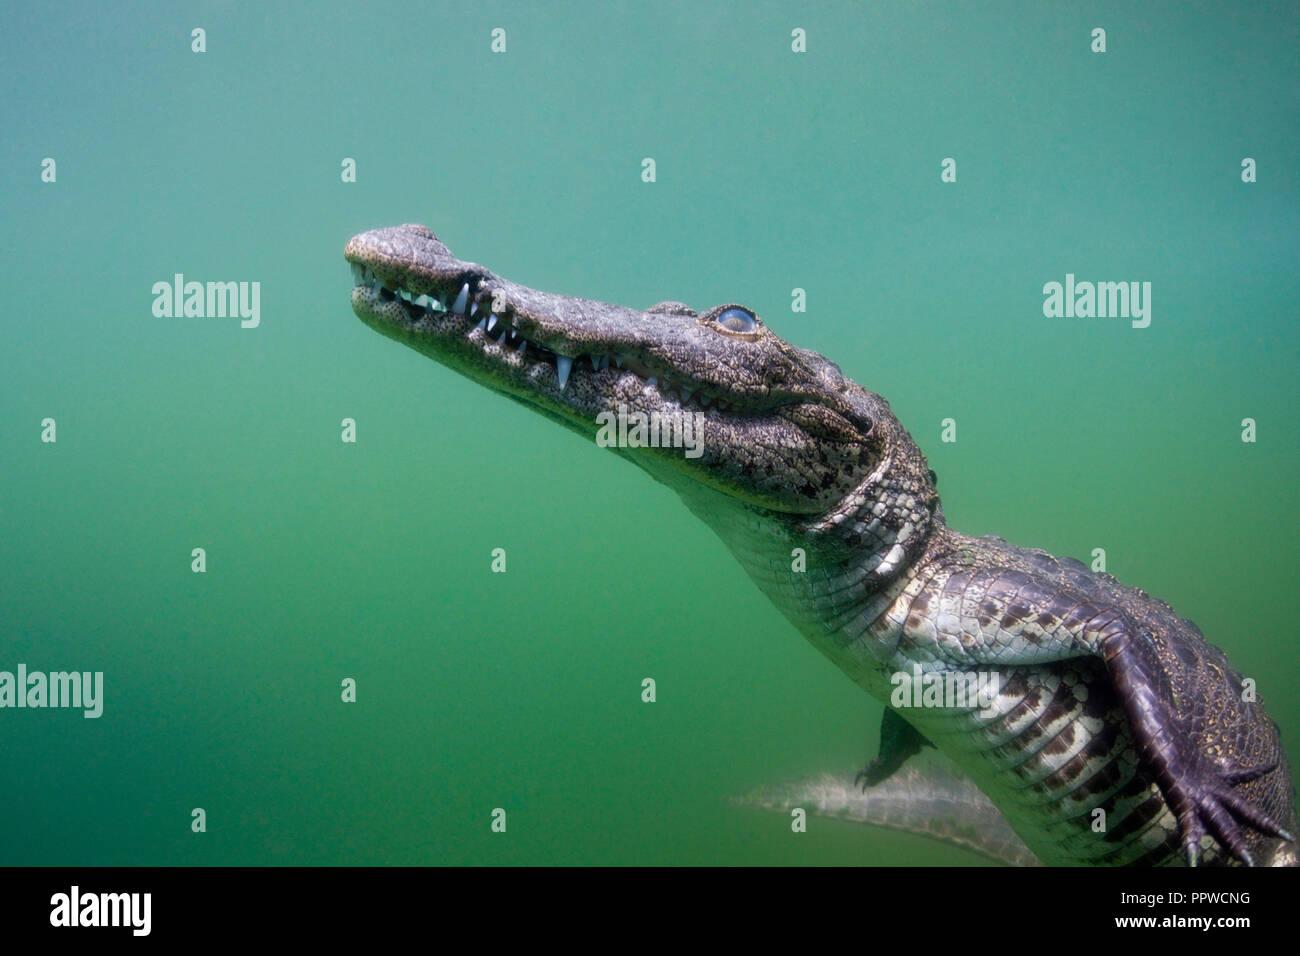 Les jeunes Crocodile, Crocodylus acutus, Floride, Everglades, USA Photo Stock